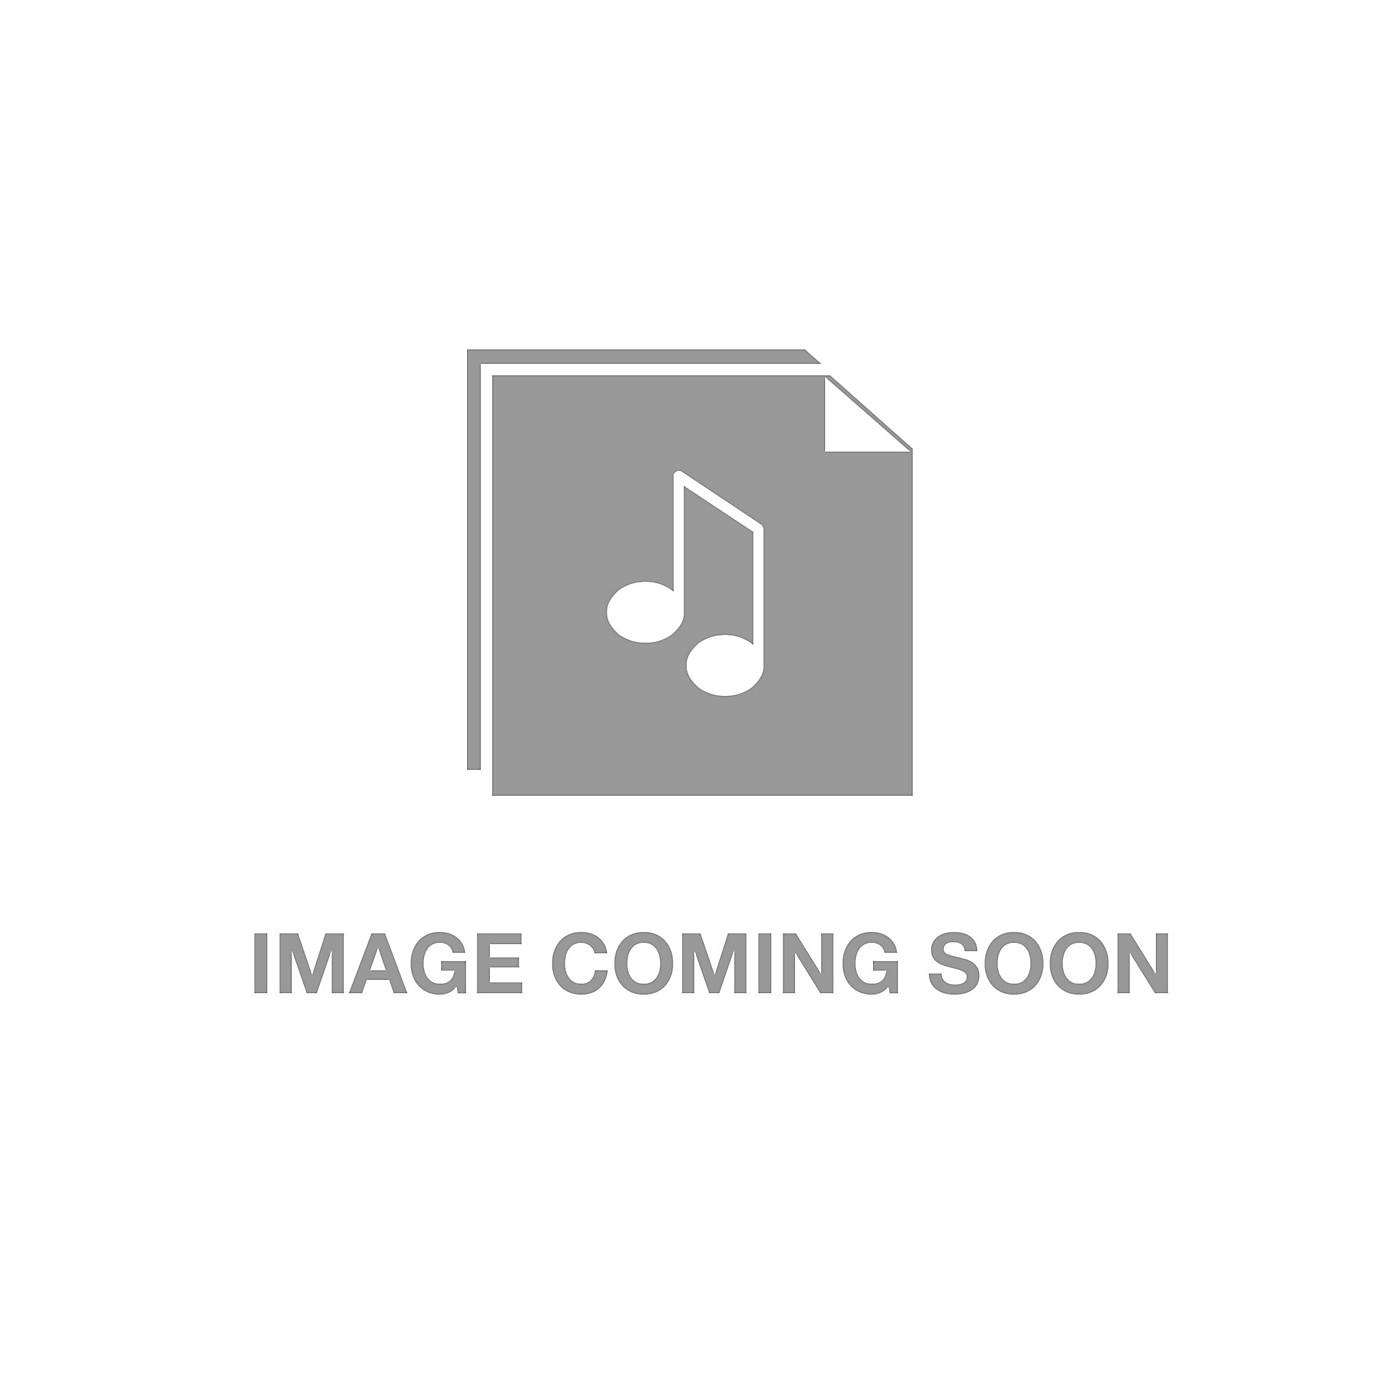 Shawnee Press Wedding Day at Troldhaugen (4-5 Octaves of Handbells) Arranged by B. Garee thumbnail